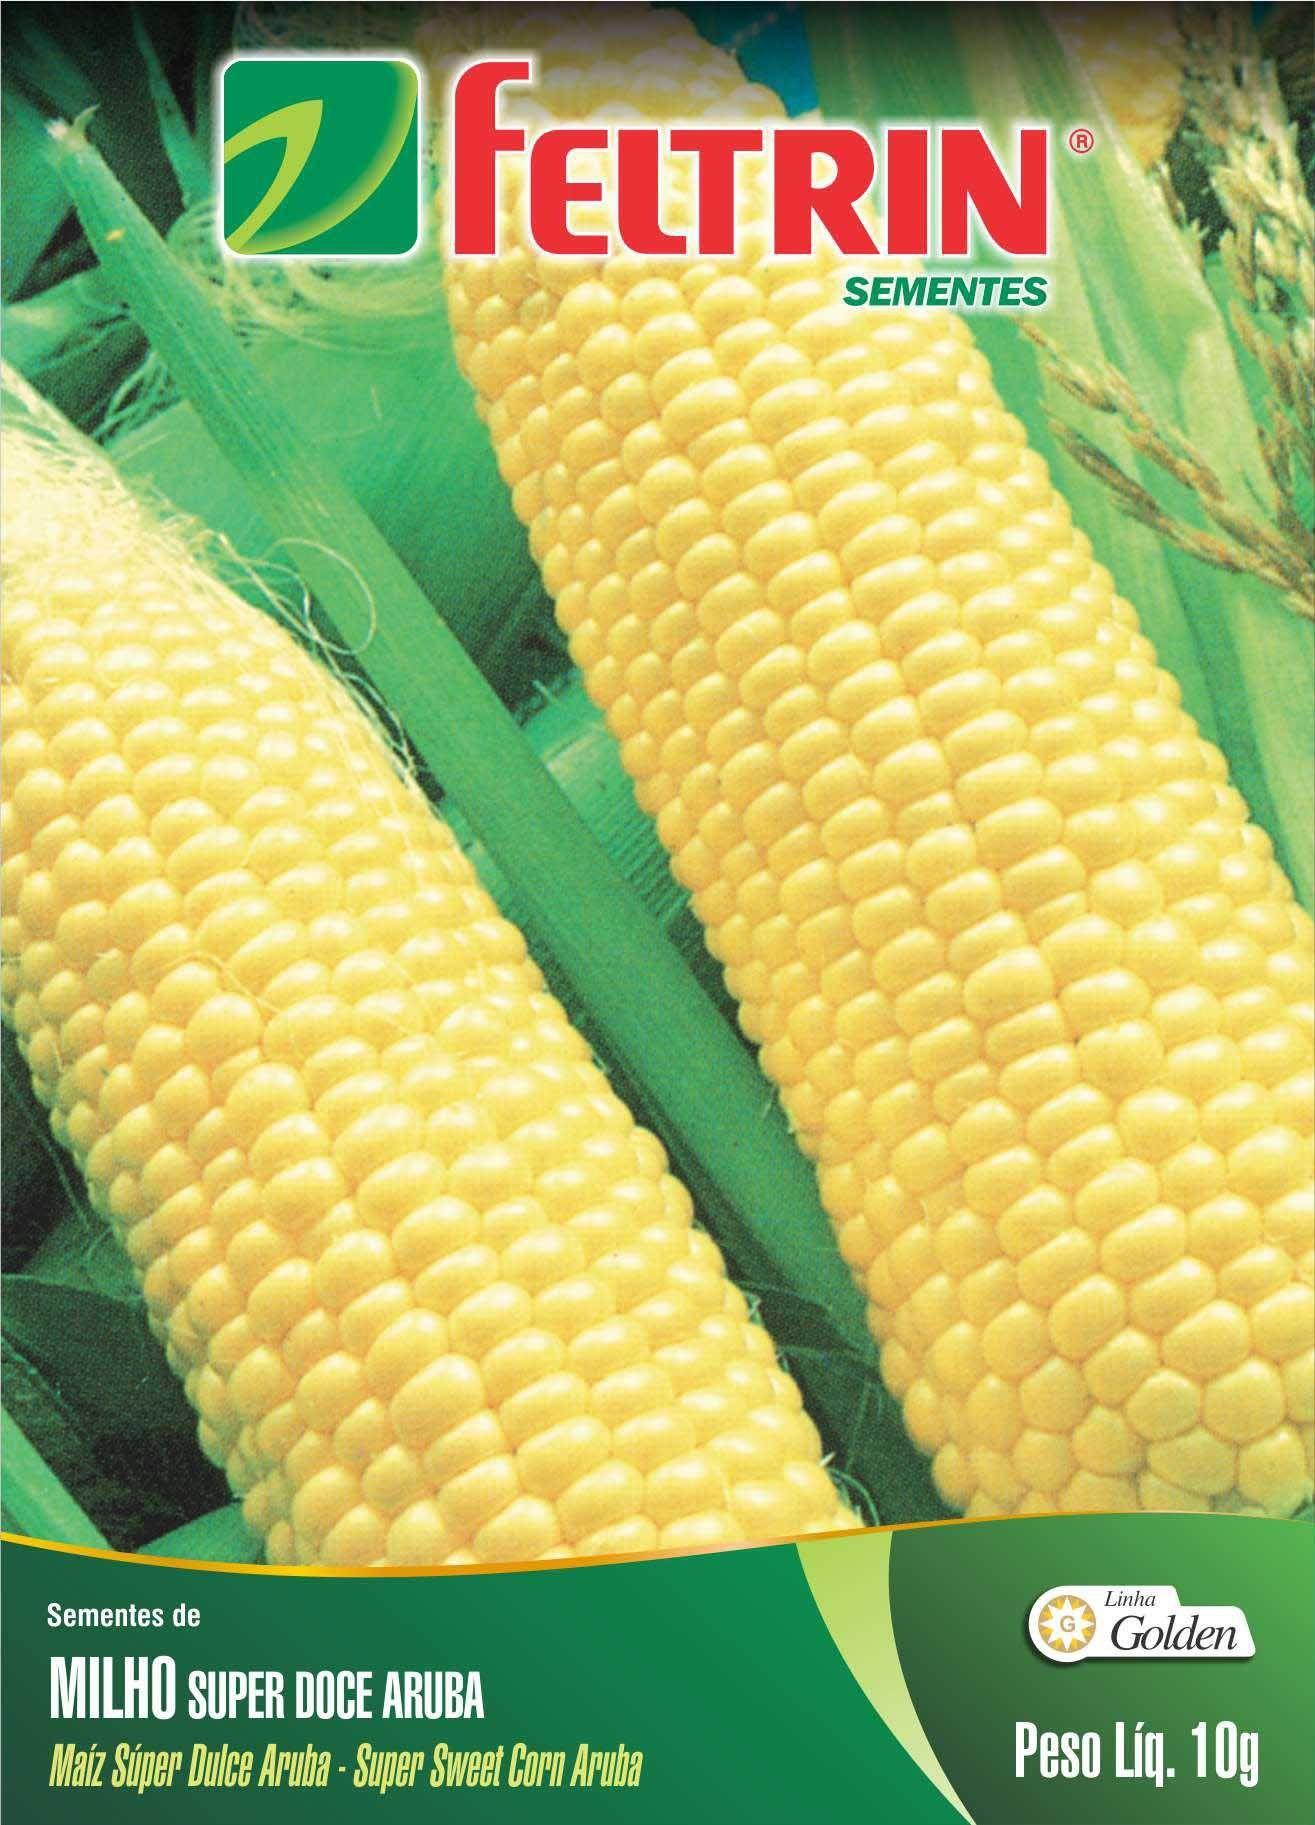 Sementes de Milho Super Doce Aruba 10g - Feltrin Linha Golden